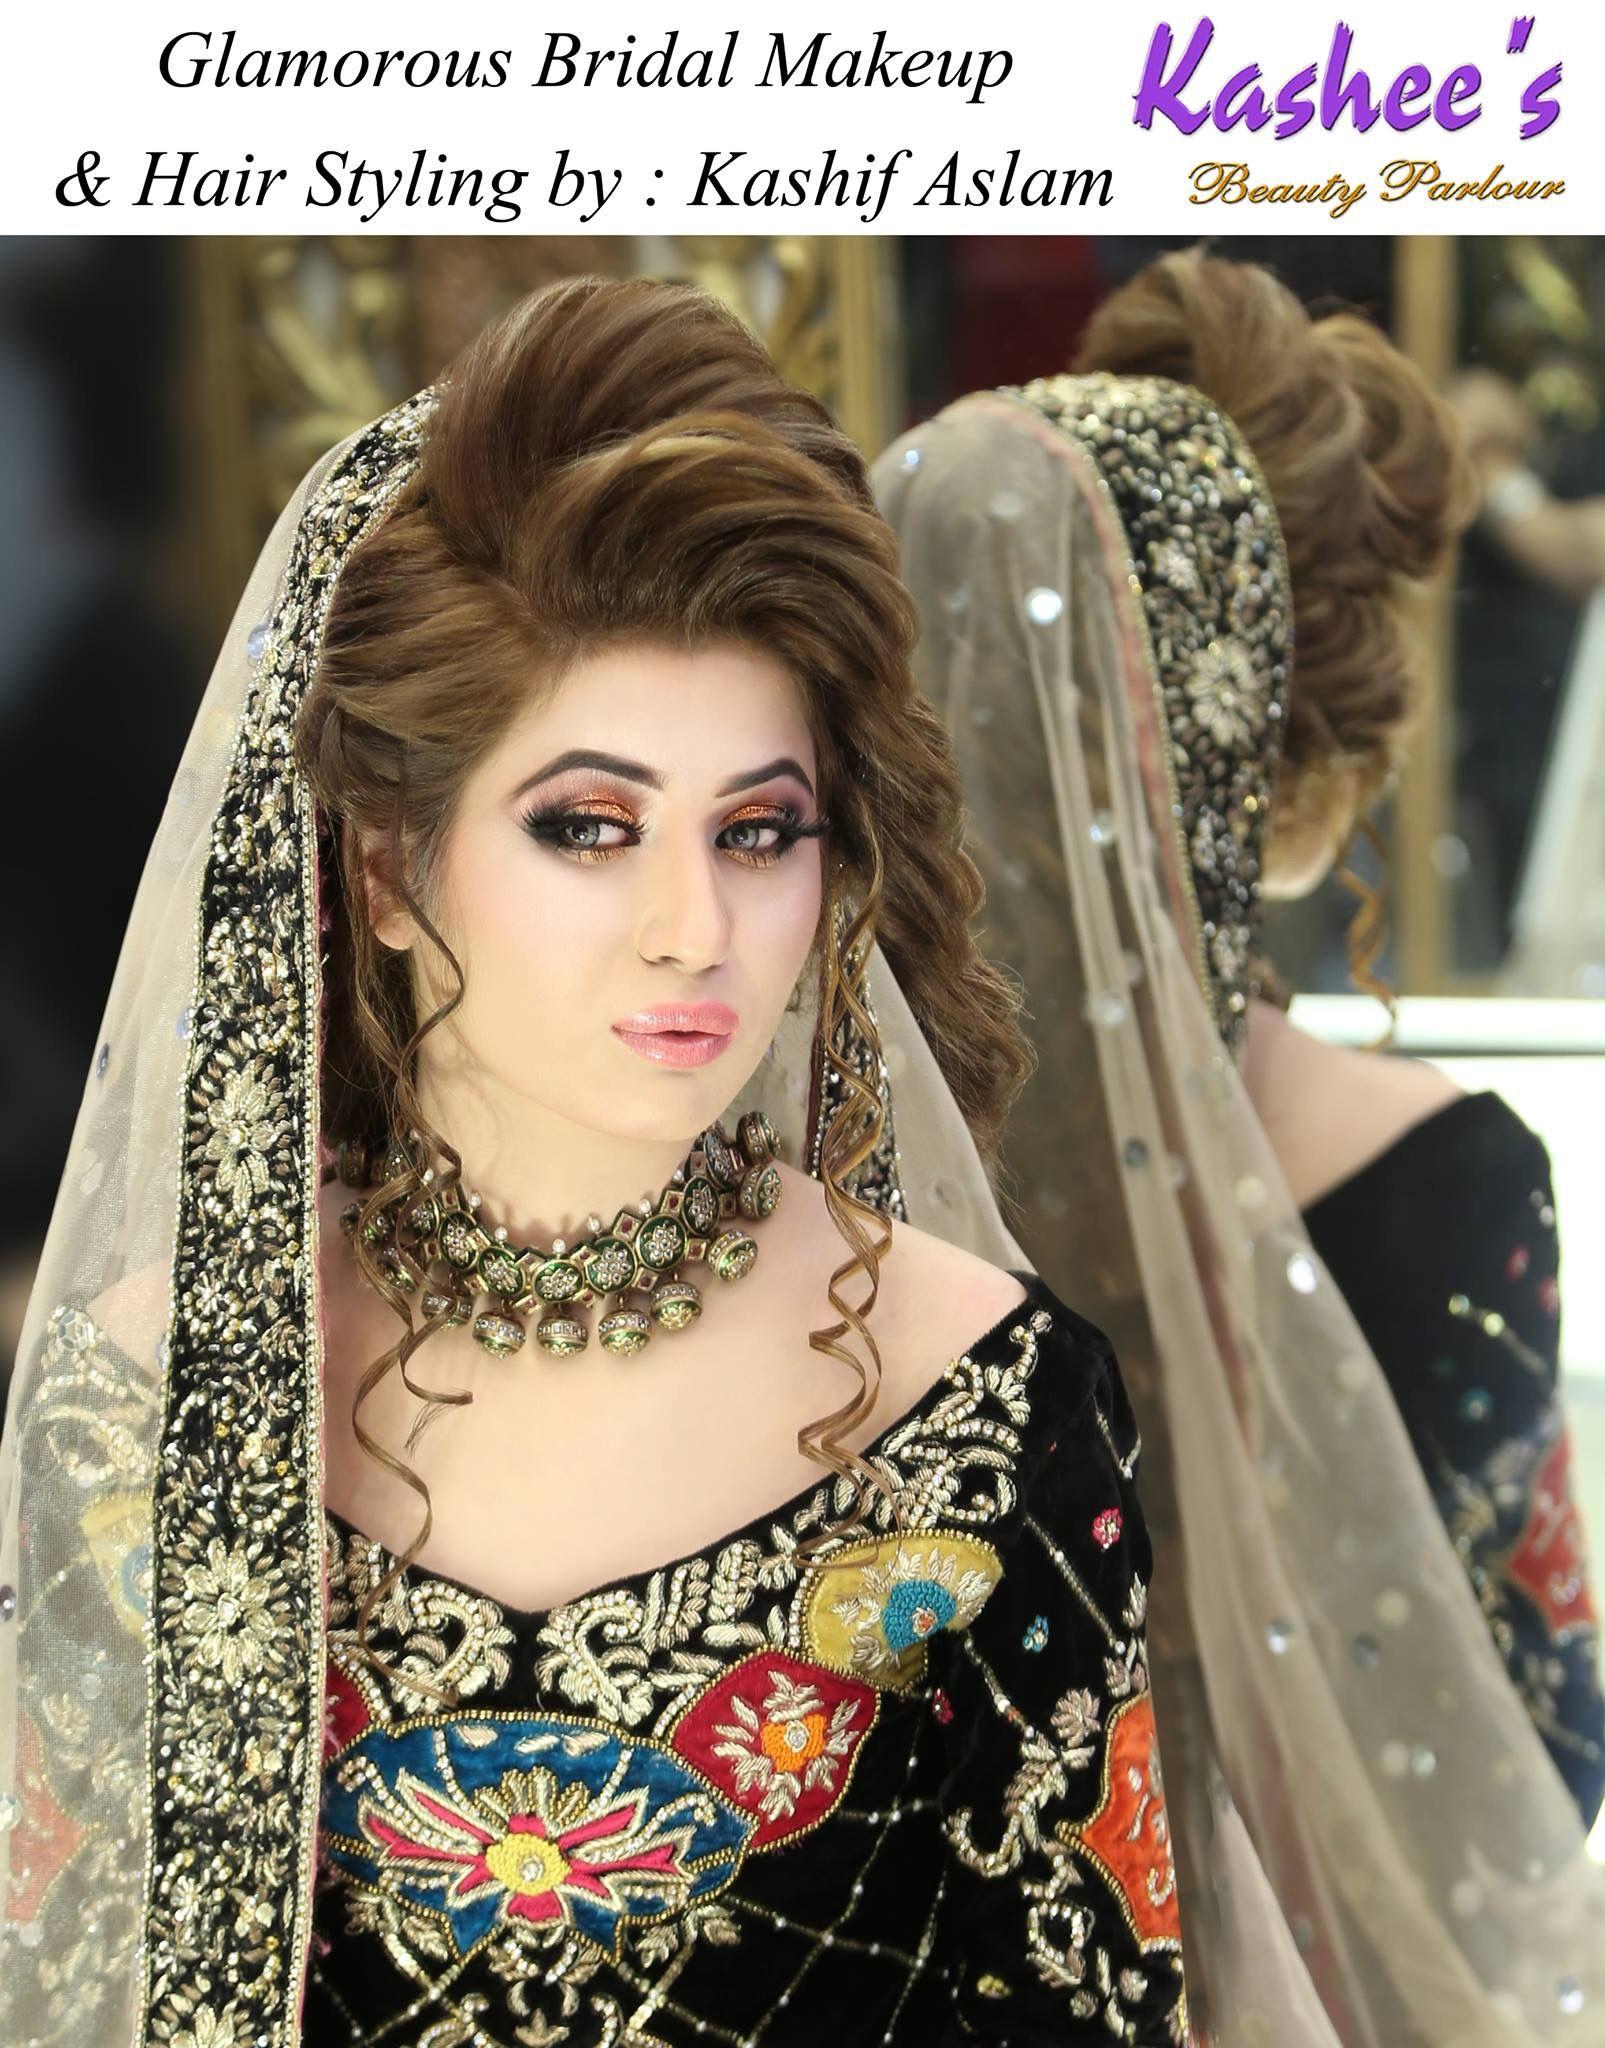 Pin By B Wan Malik On Makeup Glamour Bridal Makeup Beauty